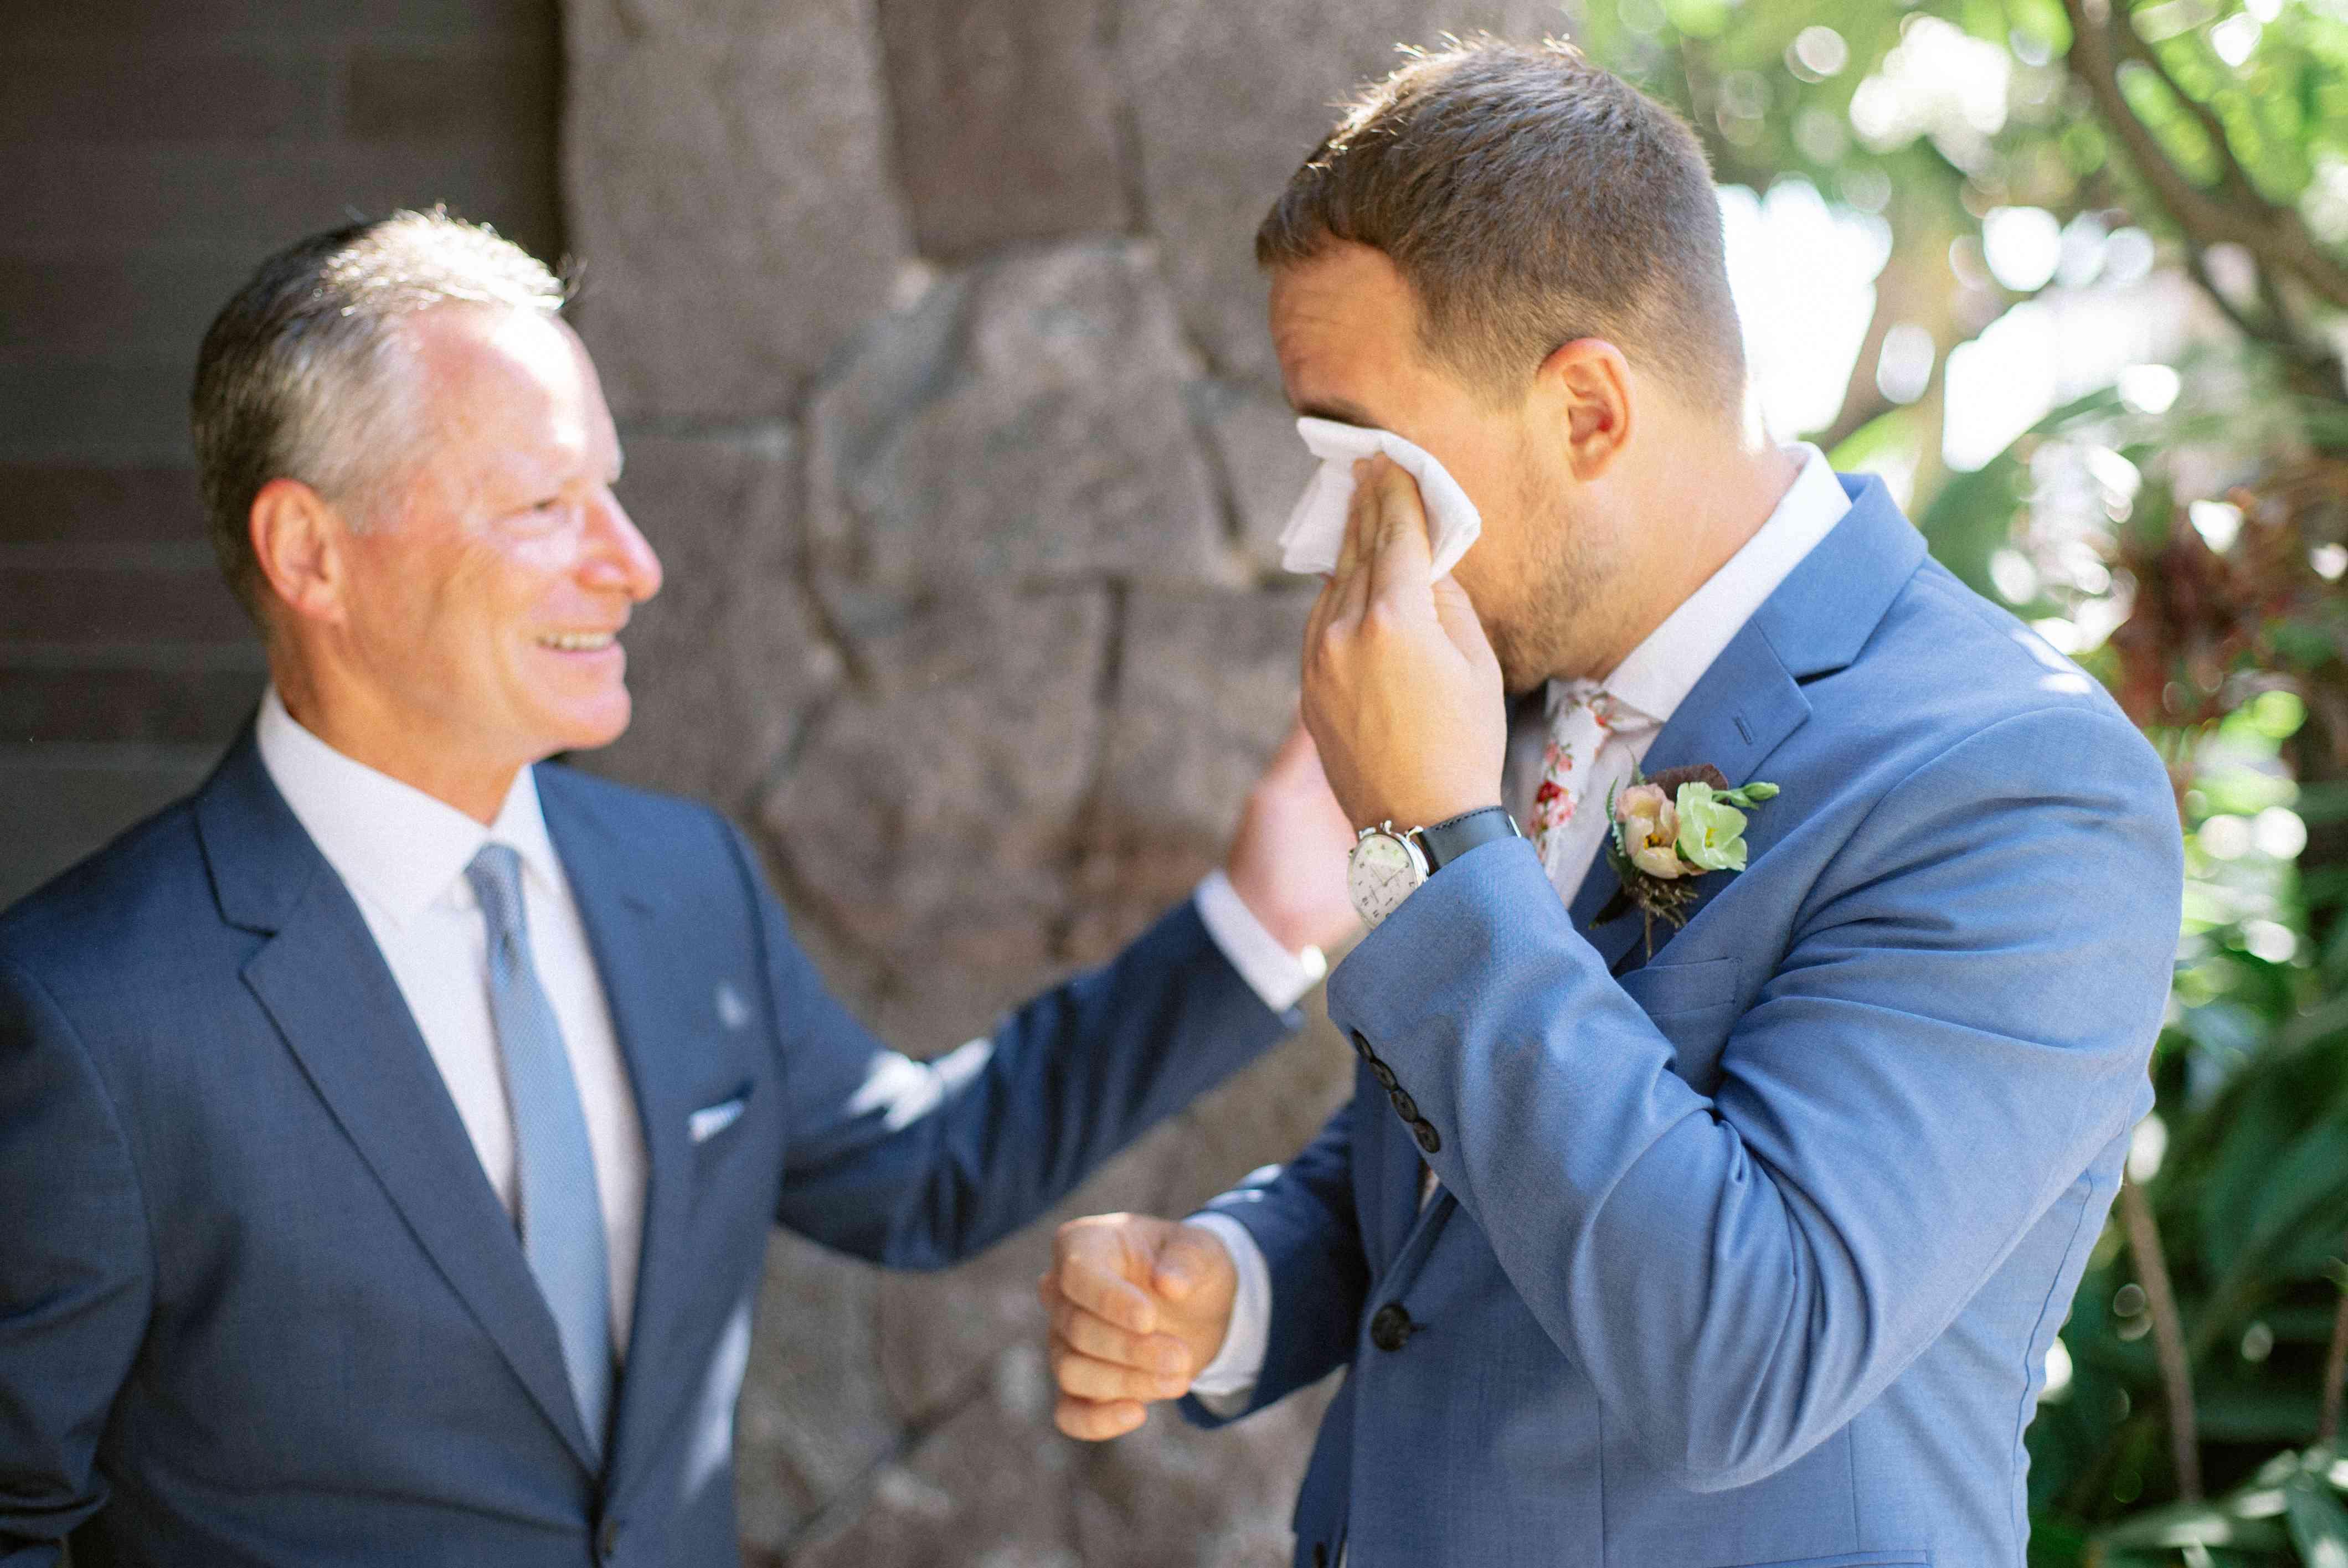 The groom gets emotional